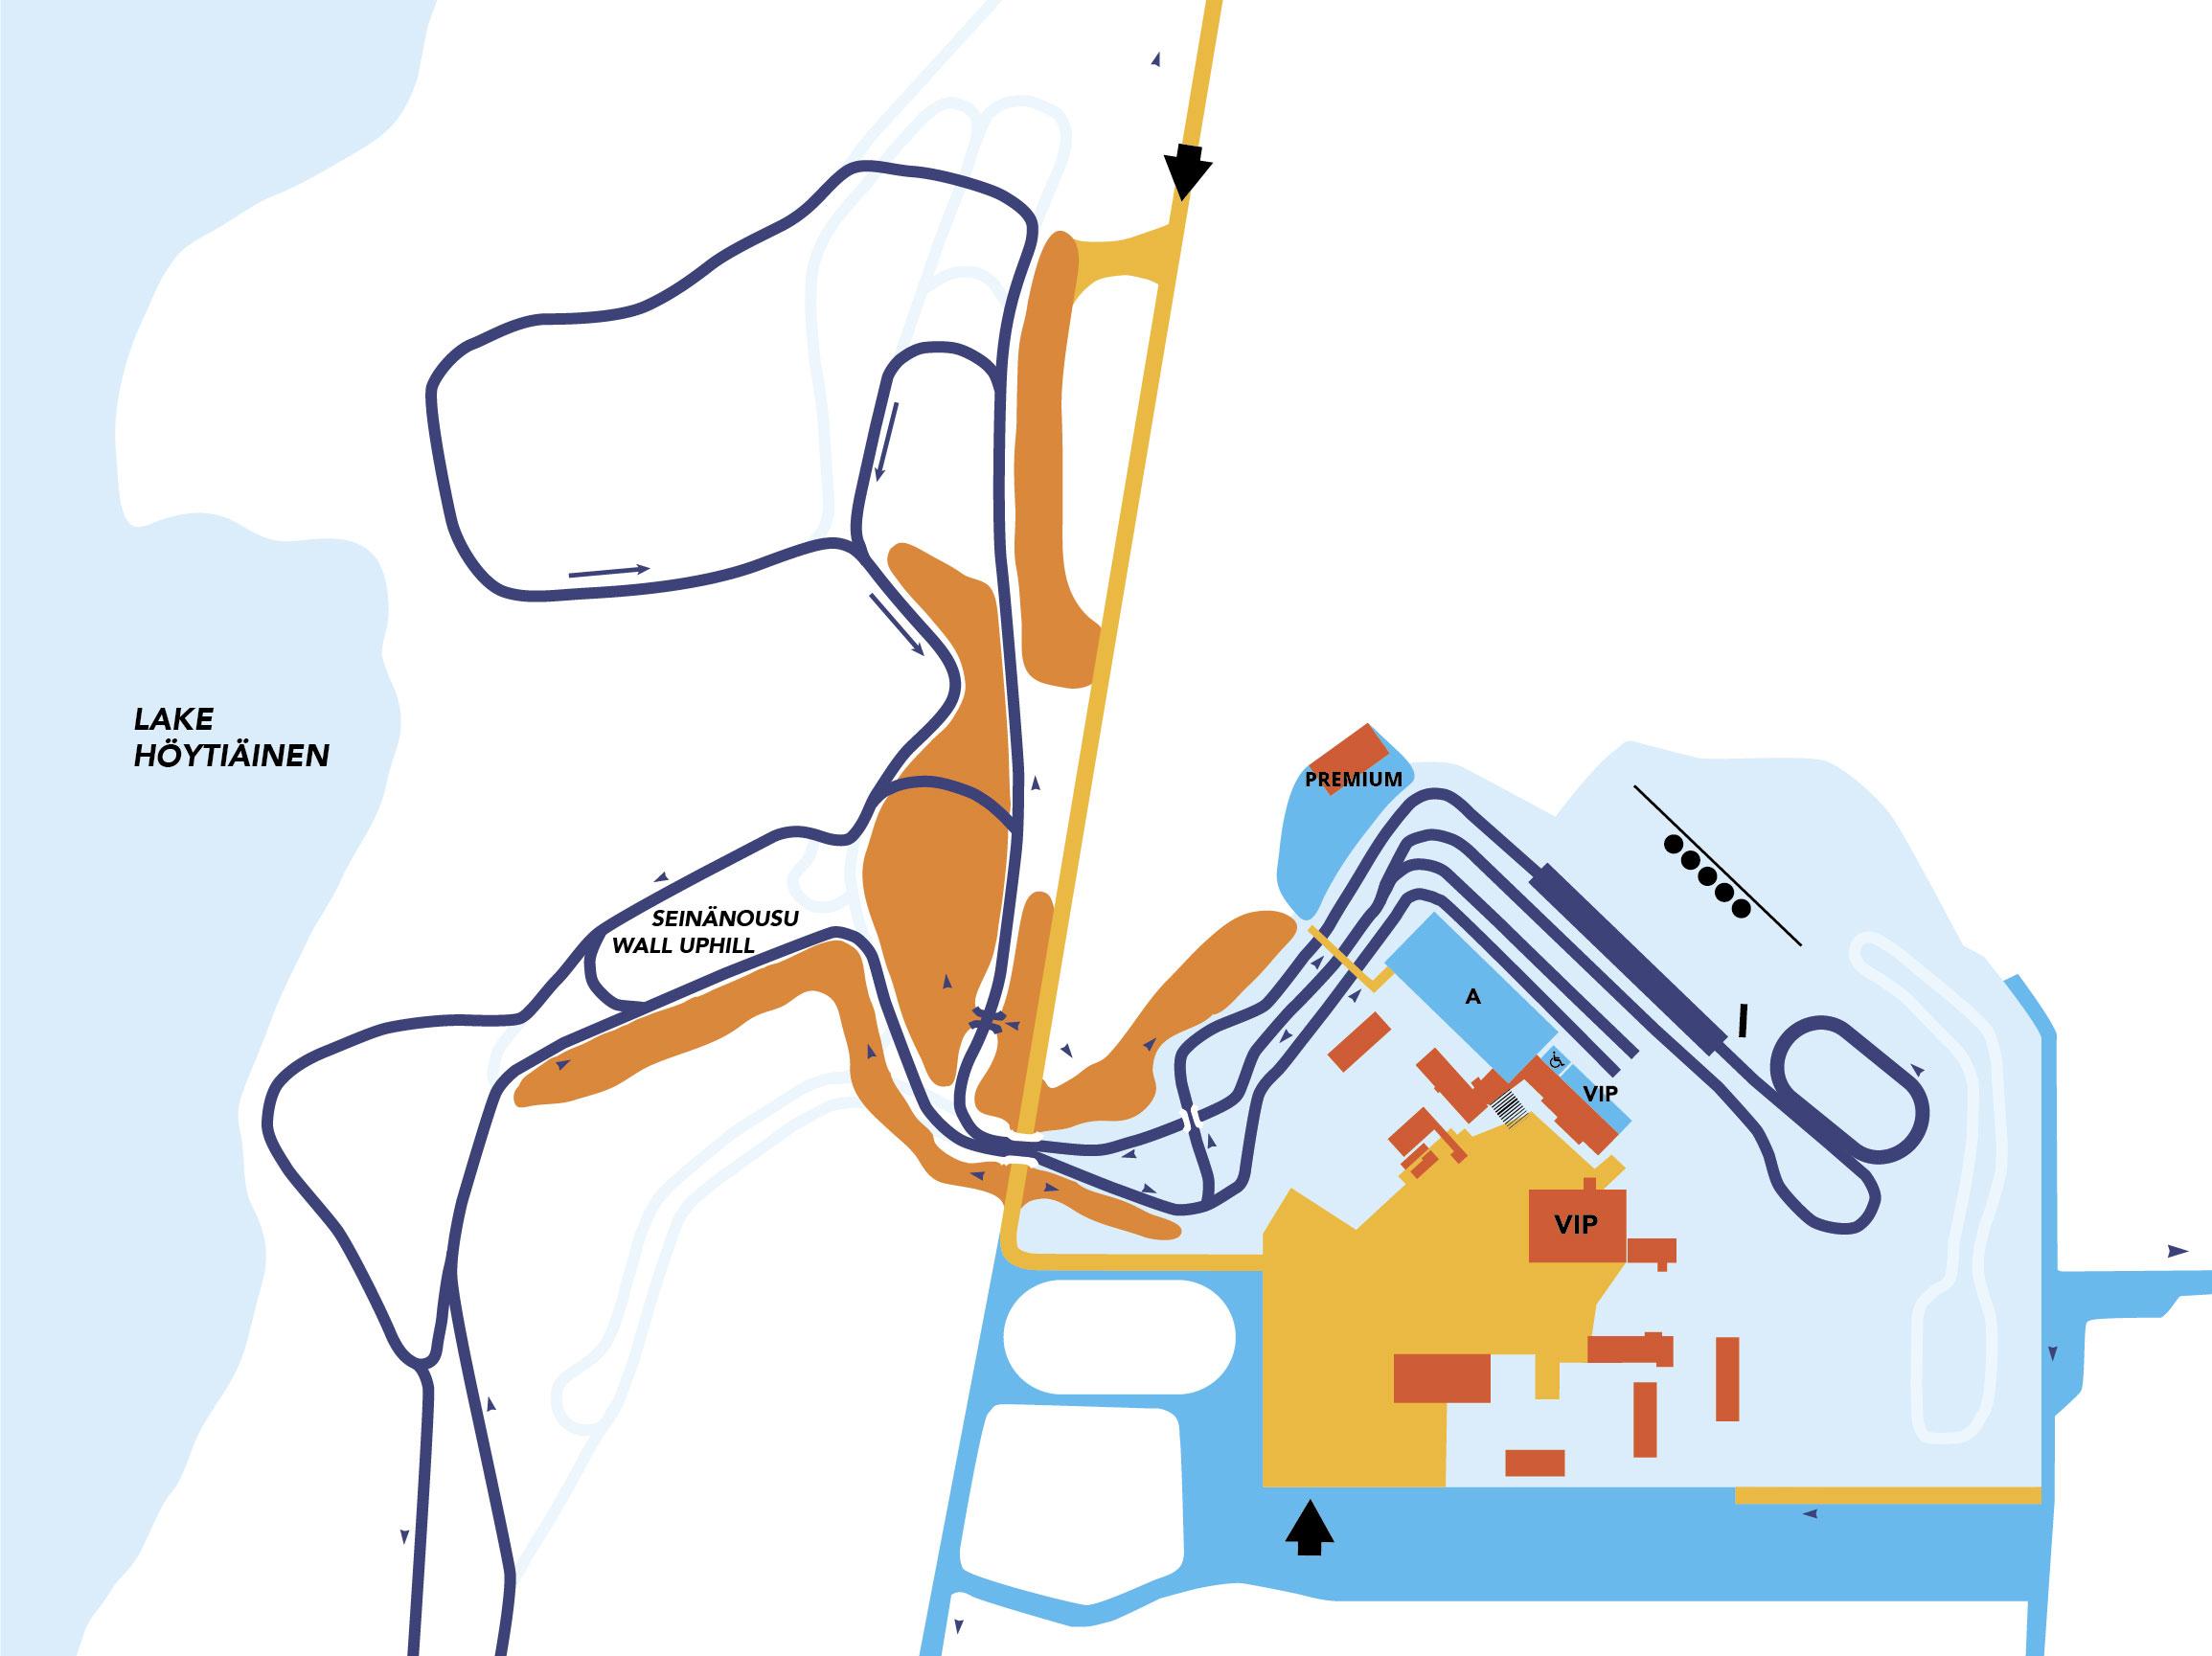 Kontiolahti Biathlon Stadium Buy Tickets Tickets For Sport Events